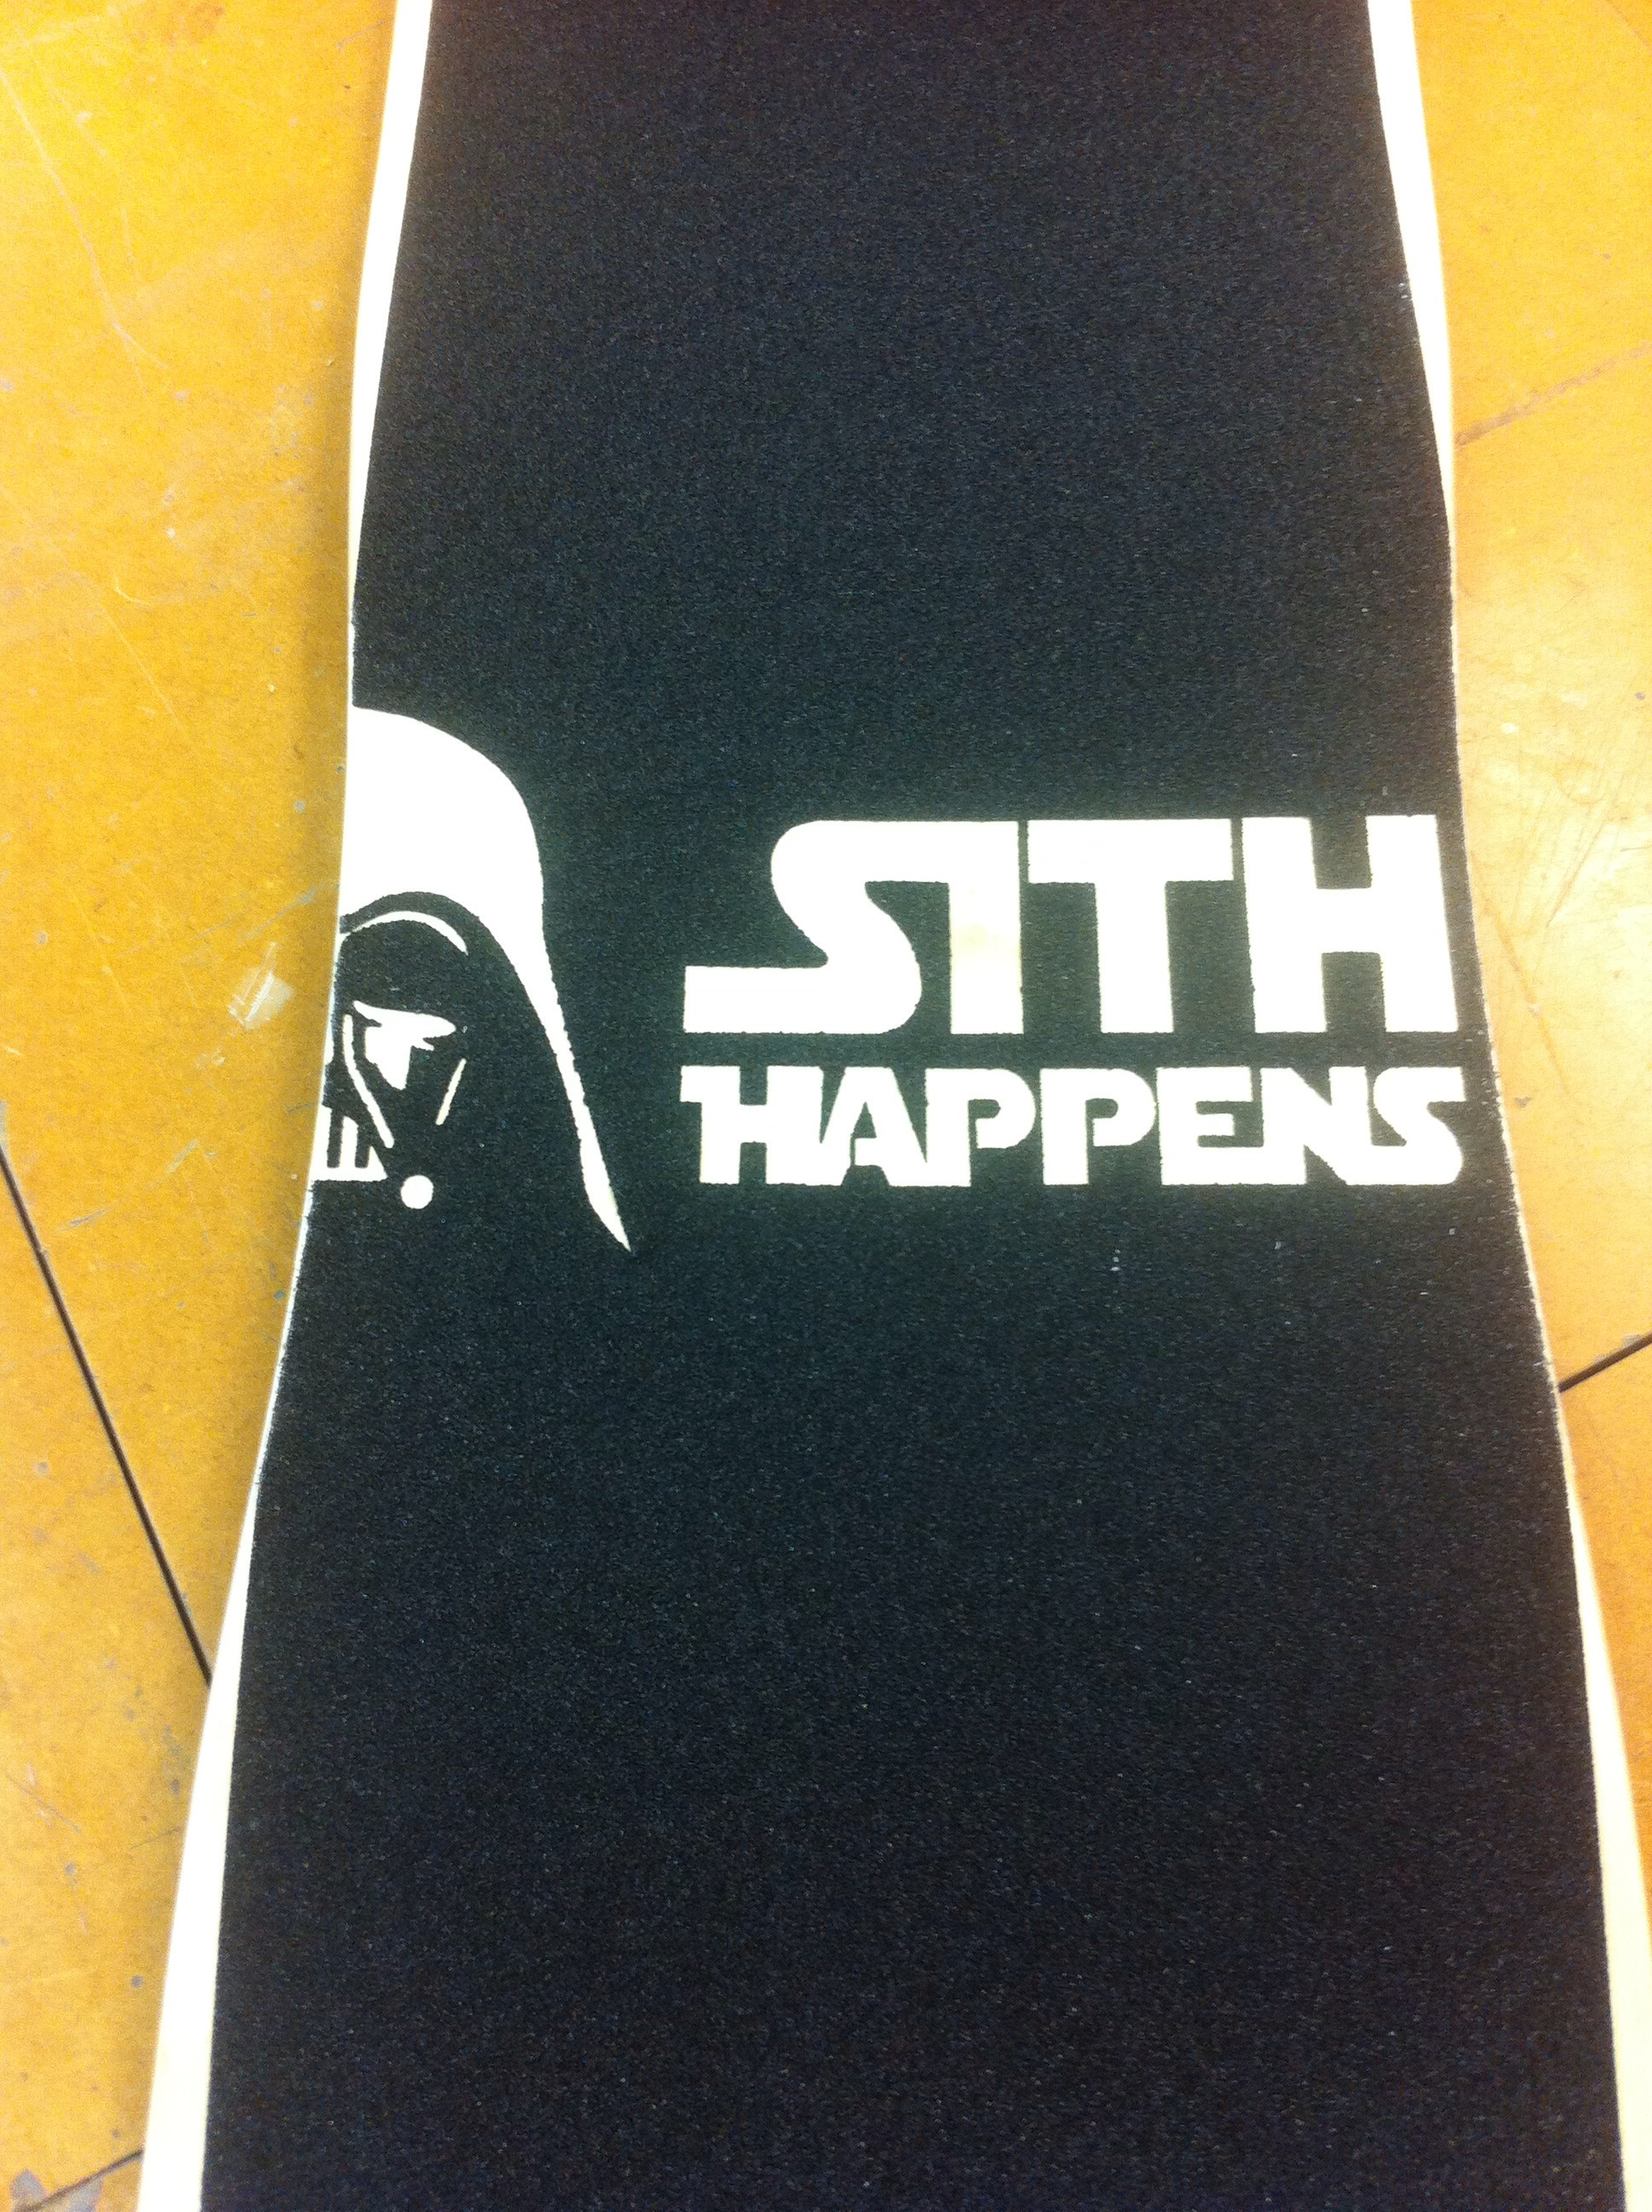 Picture of Star Wars Longboard